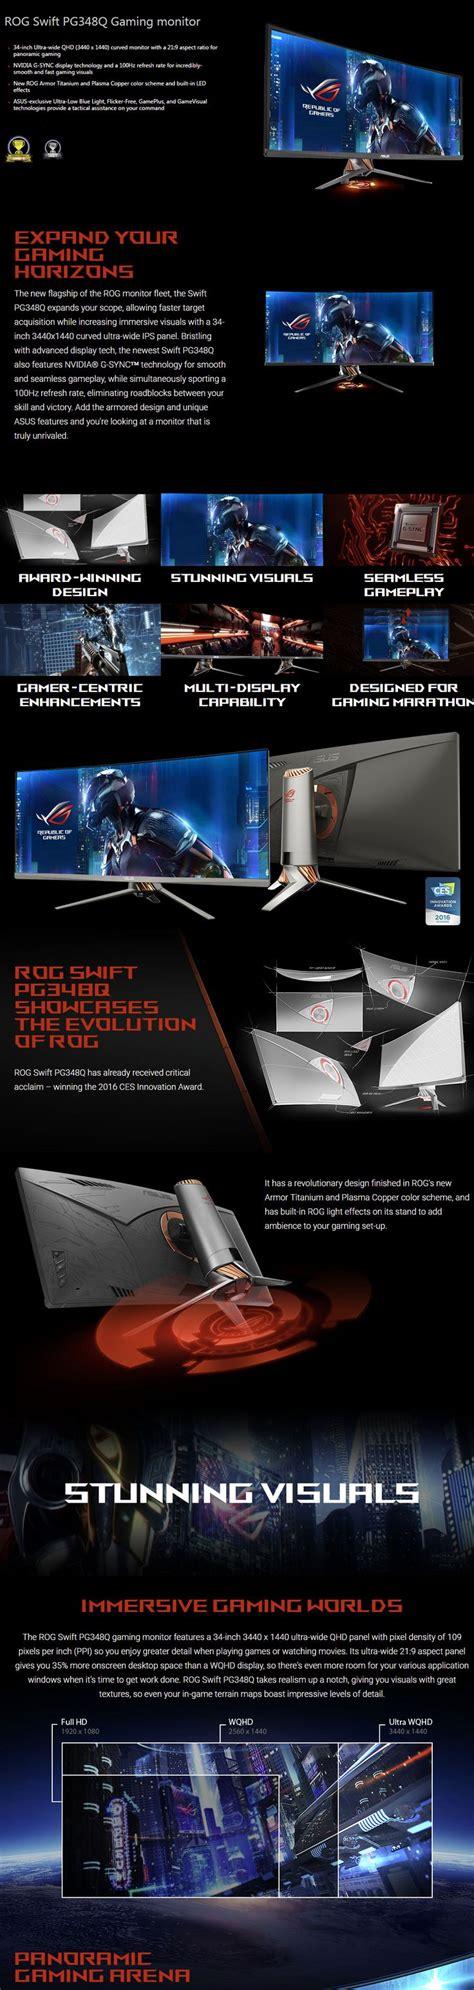 Asus Gaming Rog Gl702vm G Sync best 25 asus rog ideas on custom pc pc cases